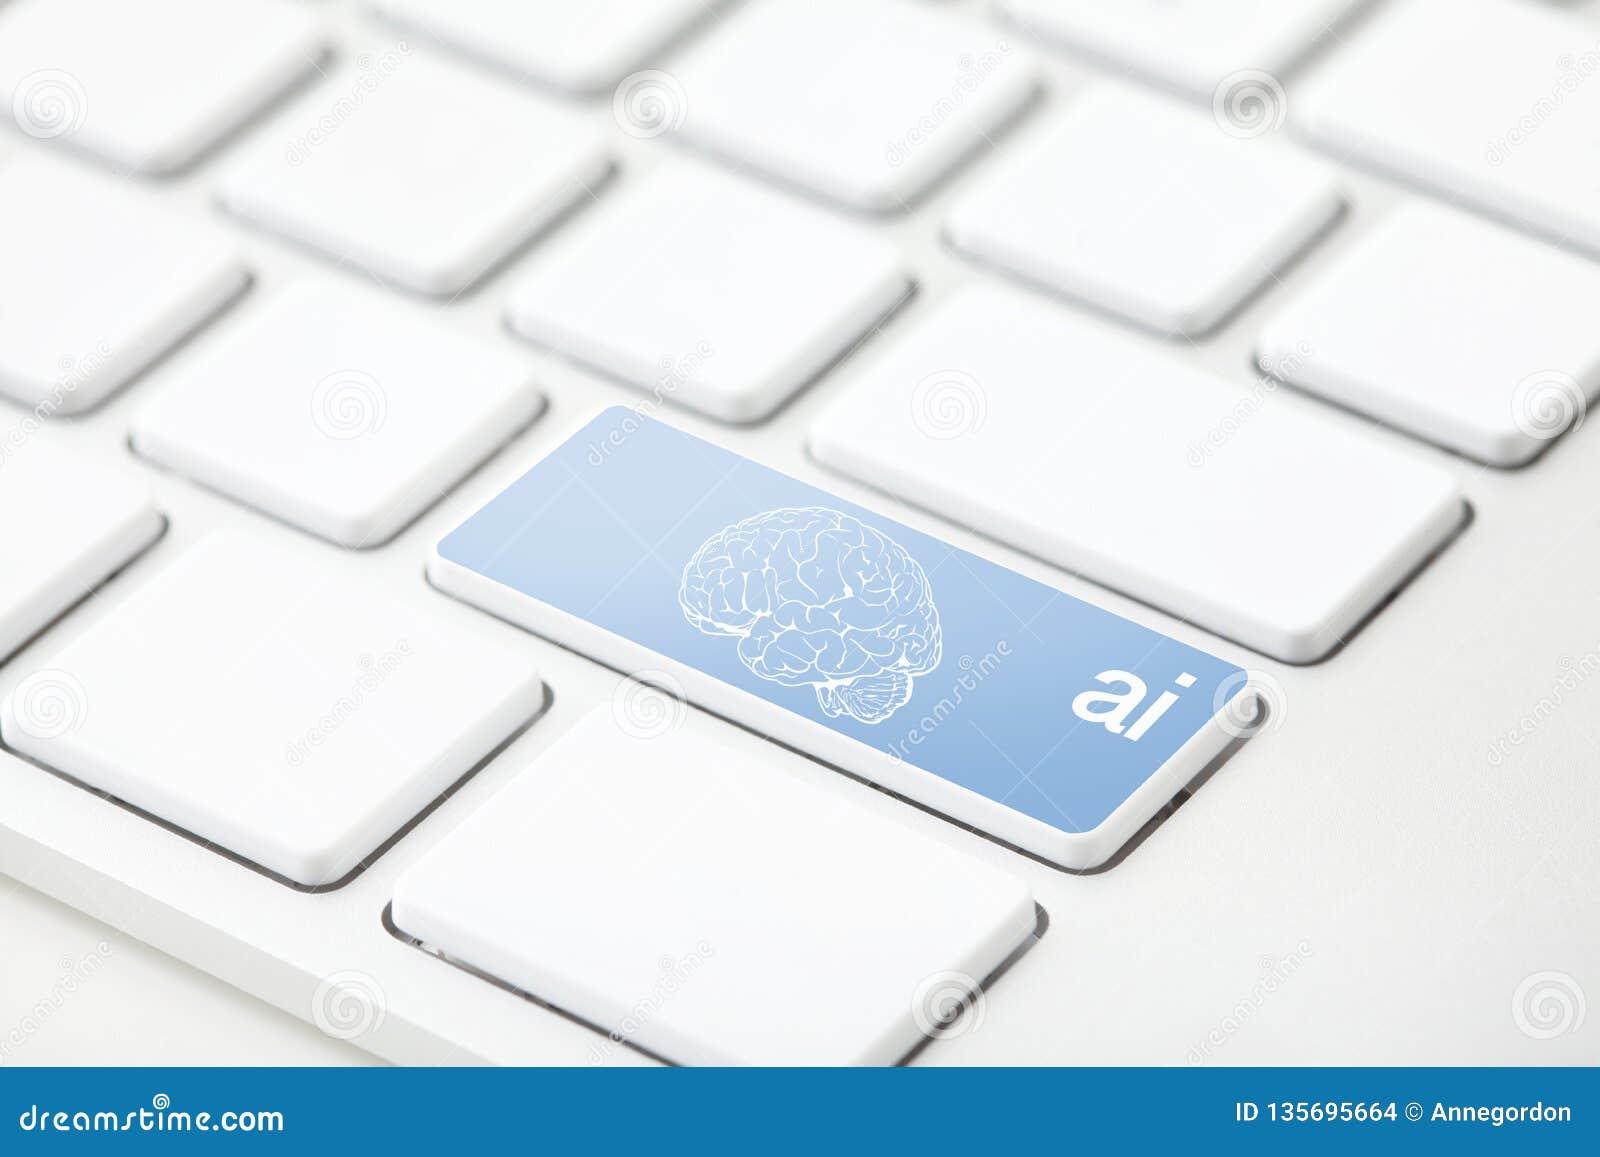 Artificial Intelligence key